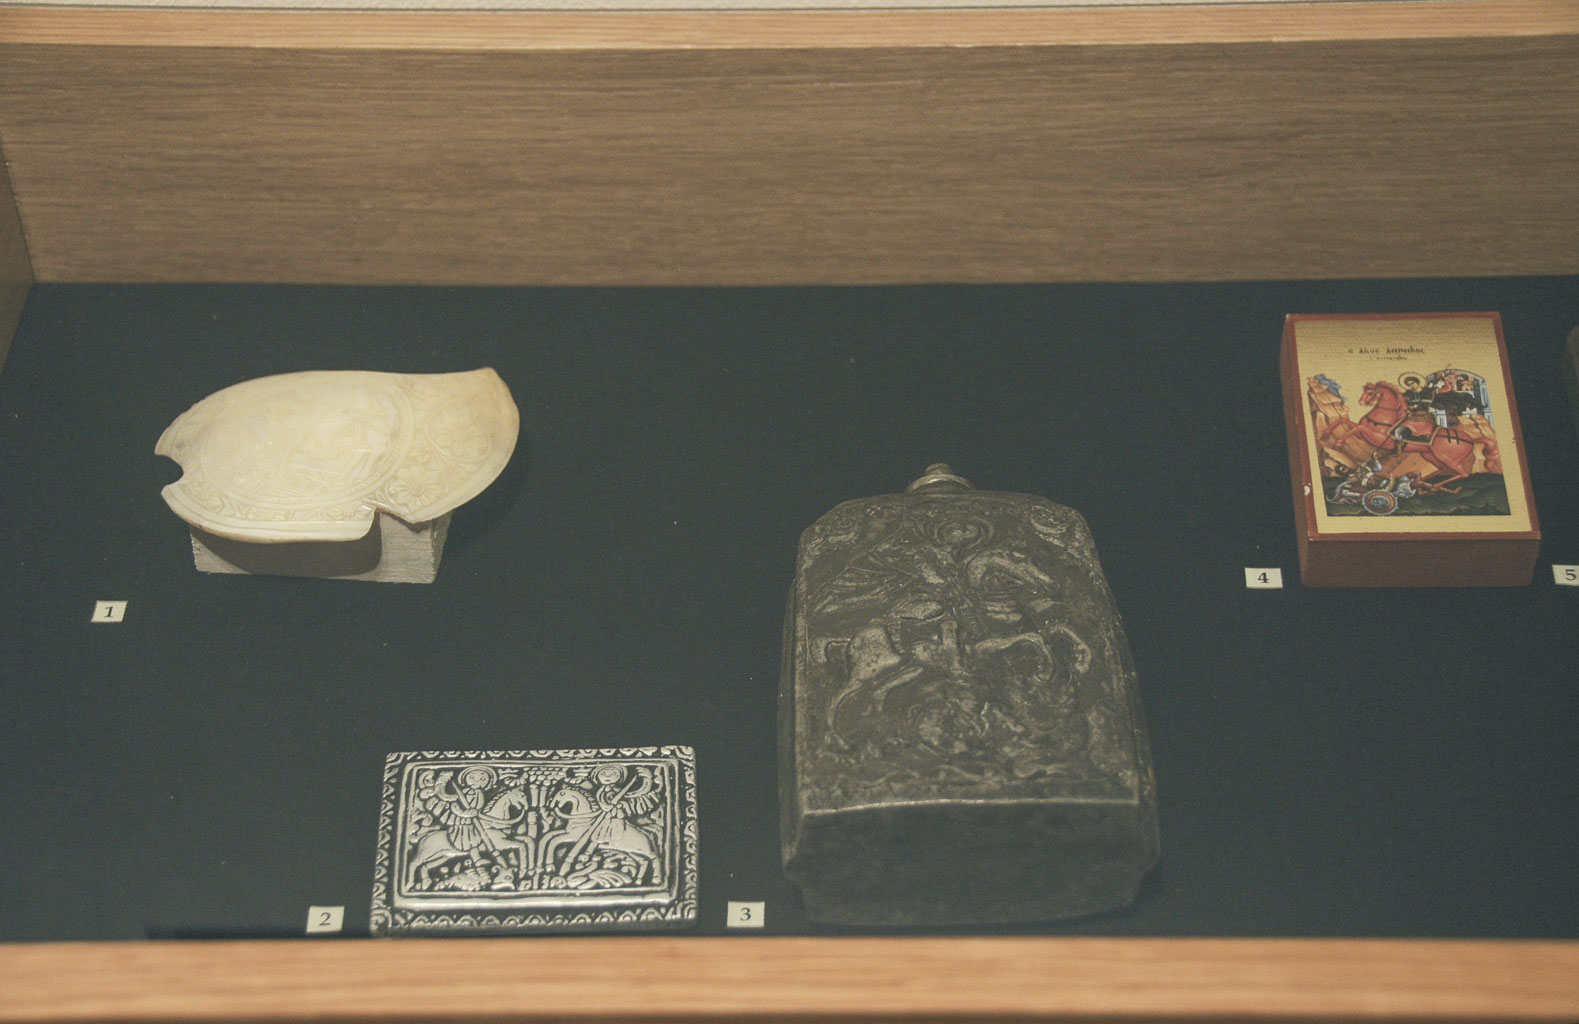 troyan-museum-jivotat-na-edna-idea-20